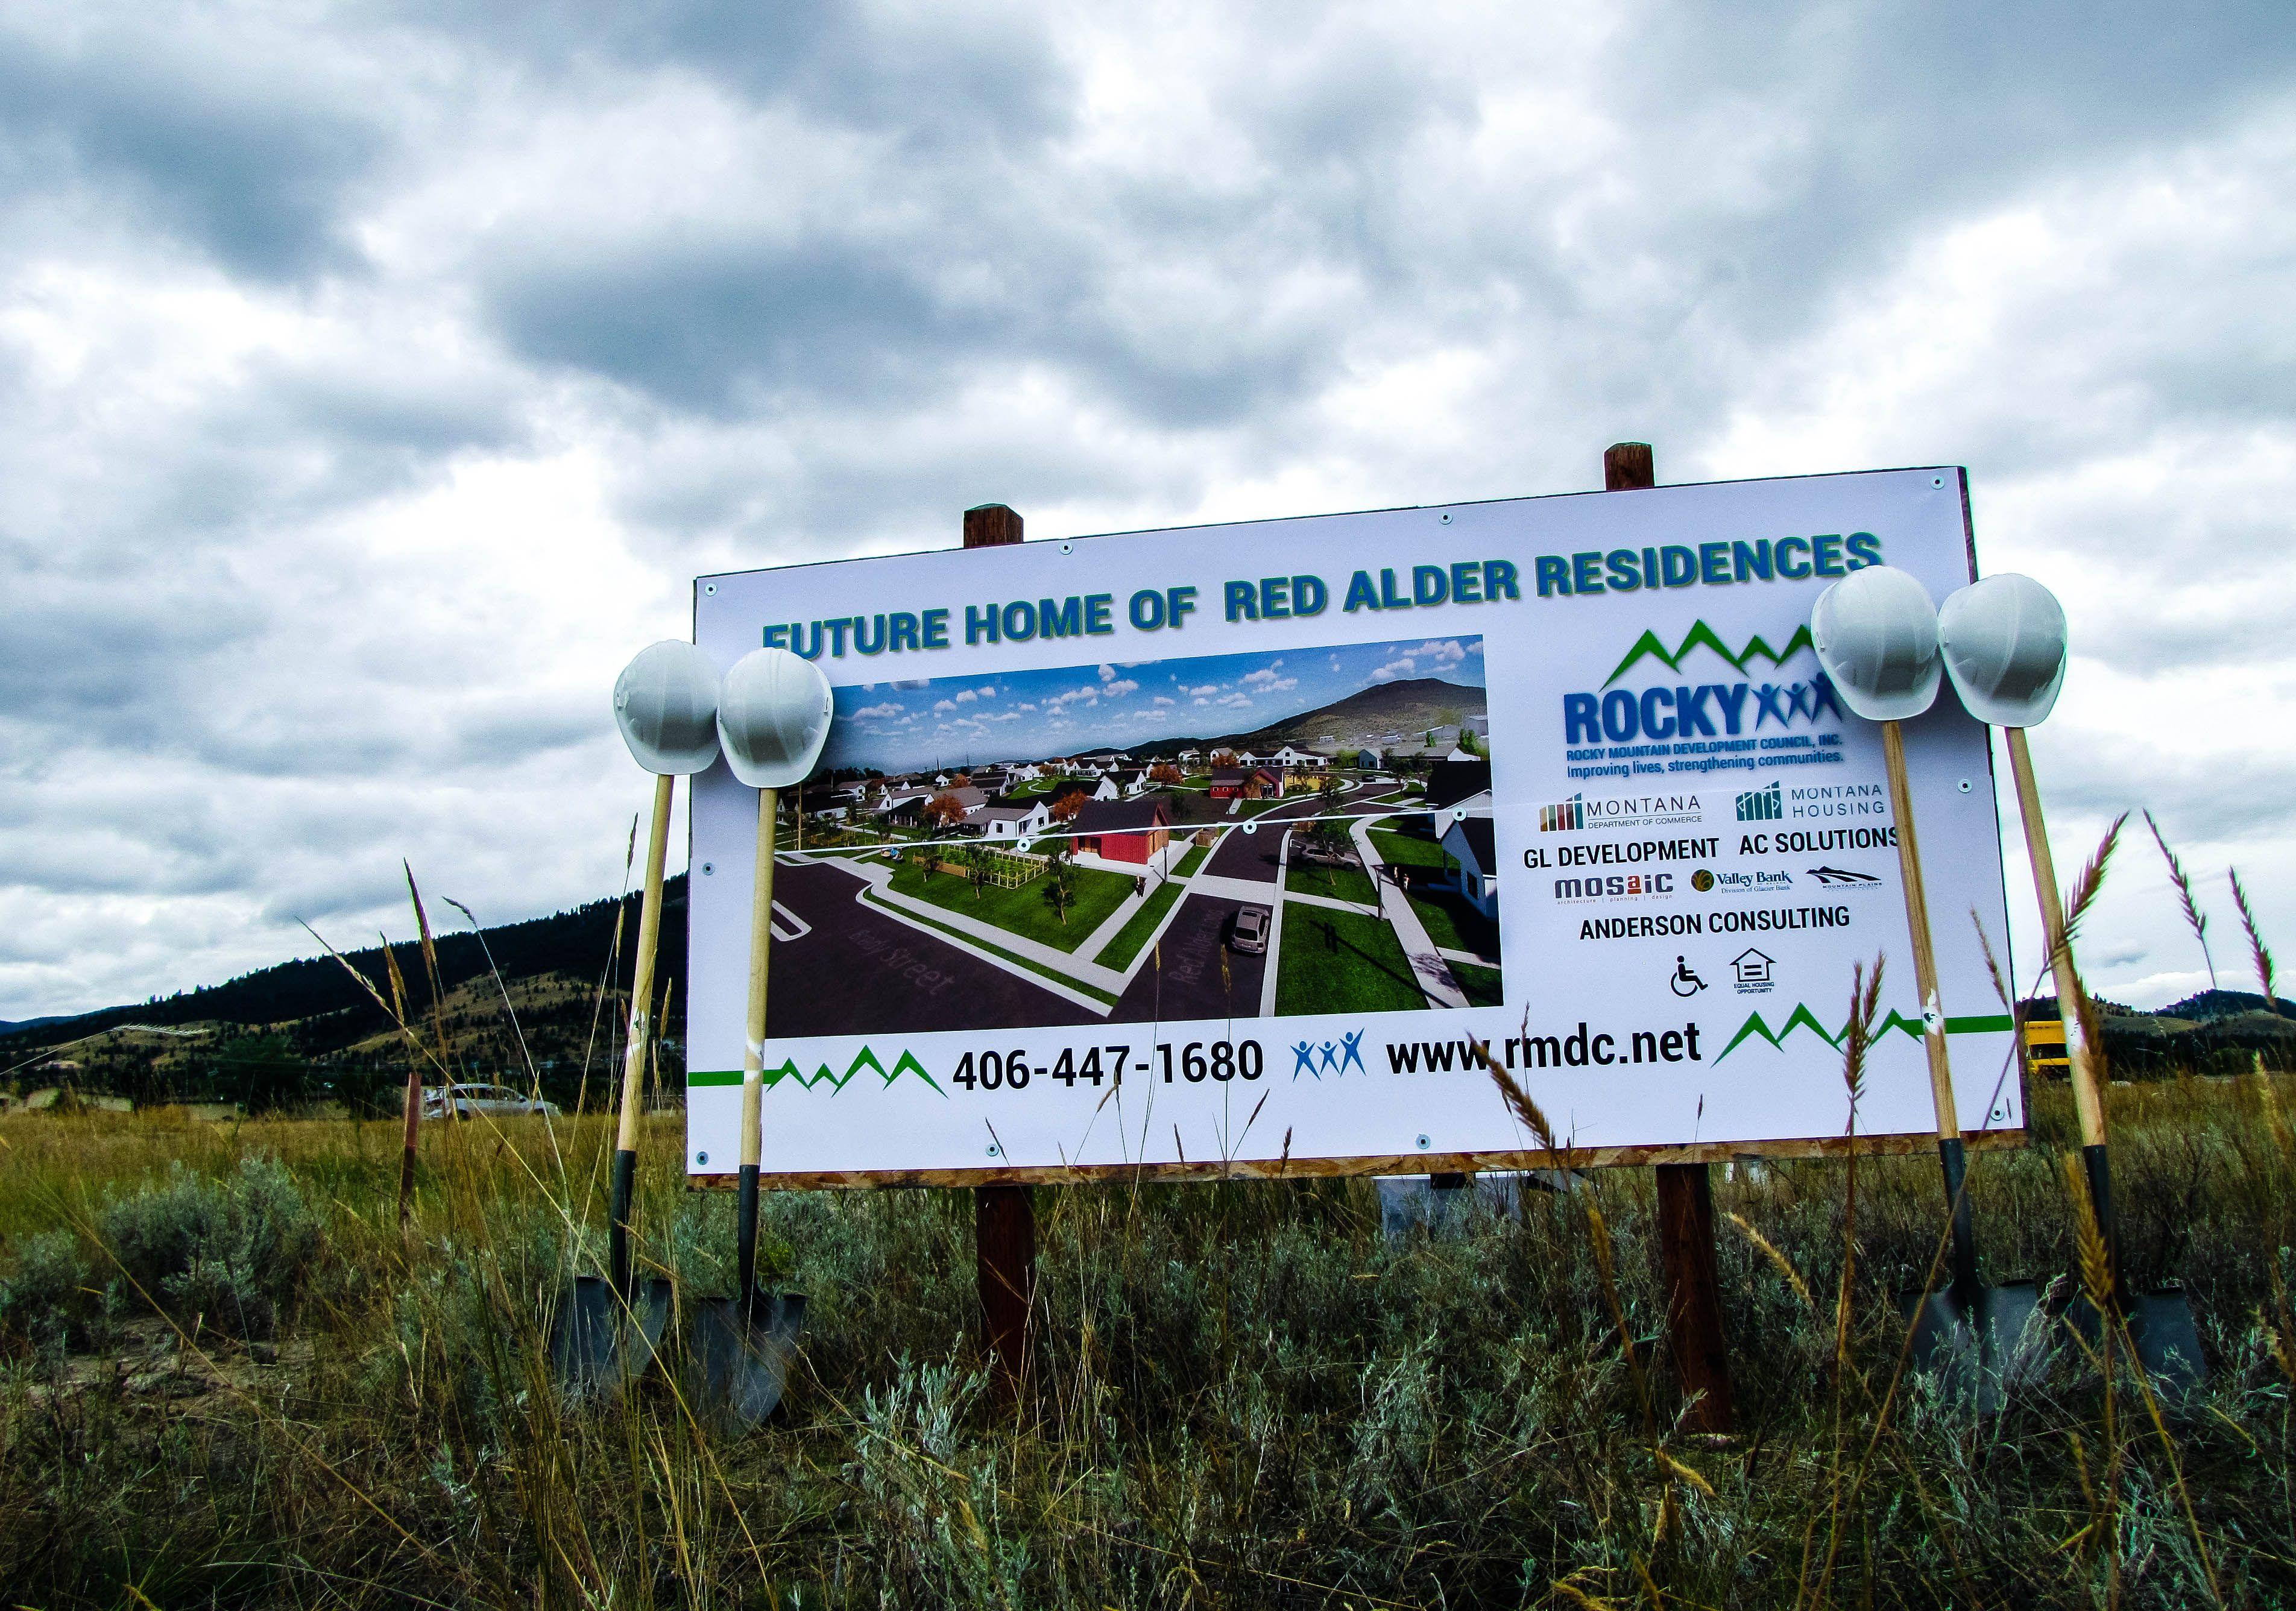 The Rebound: Red Alder Residences update